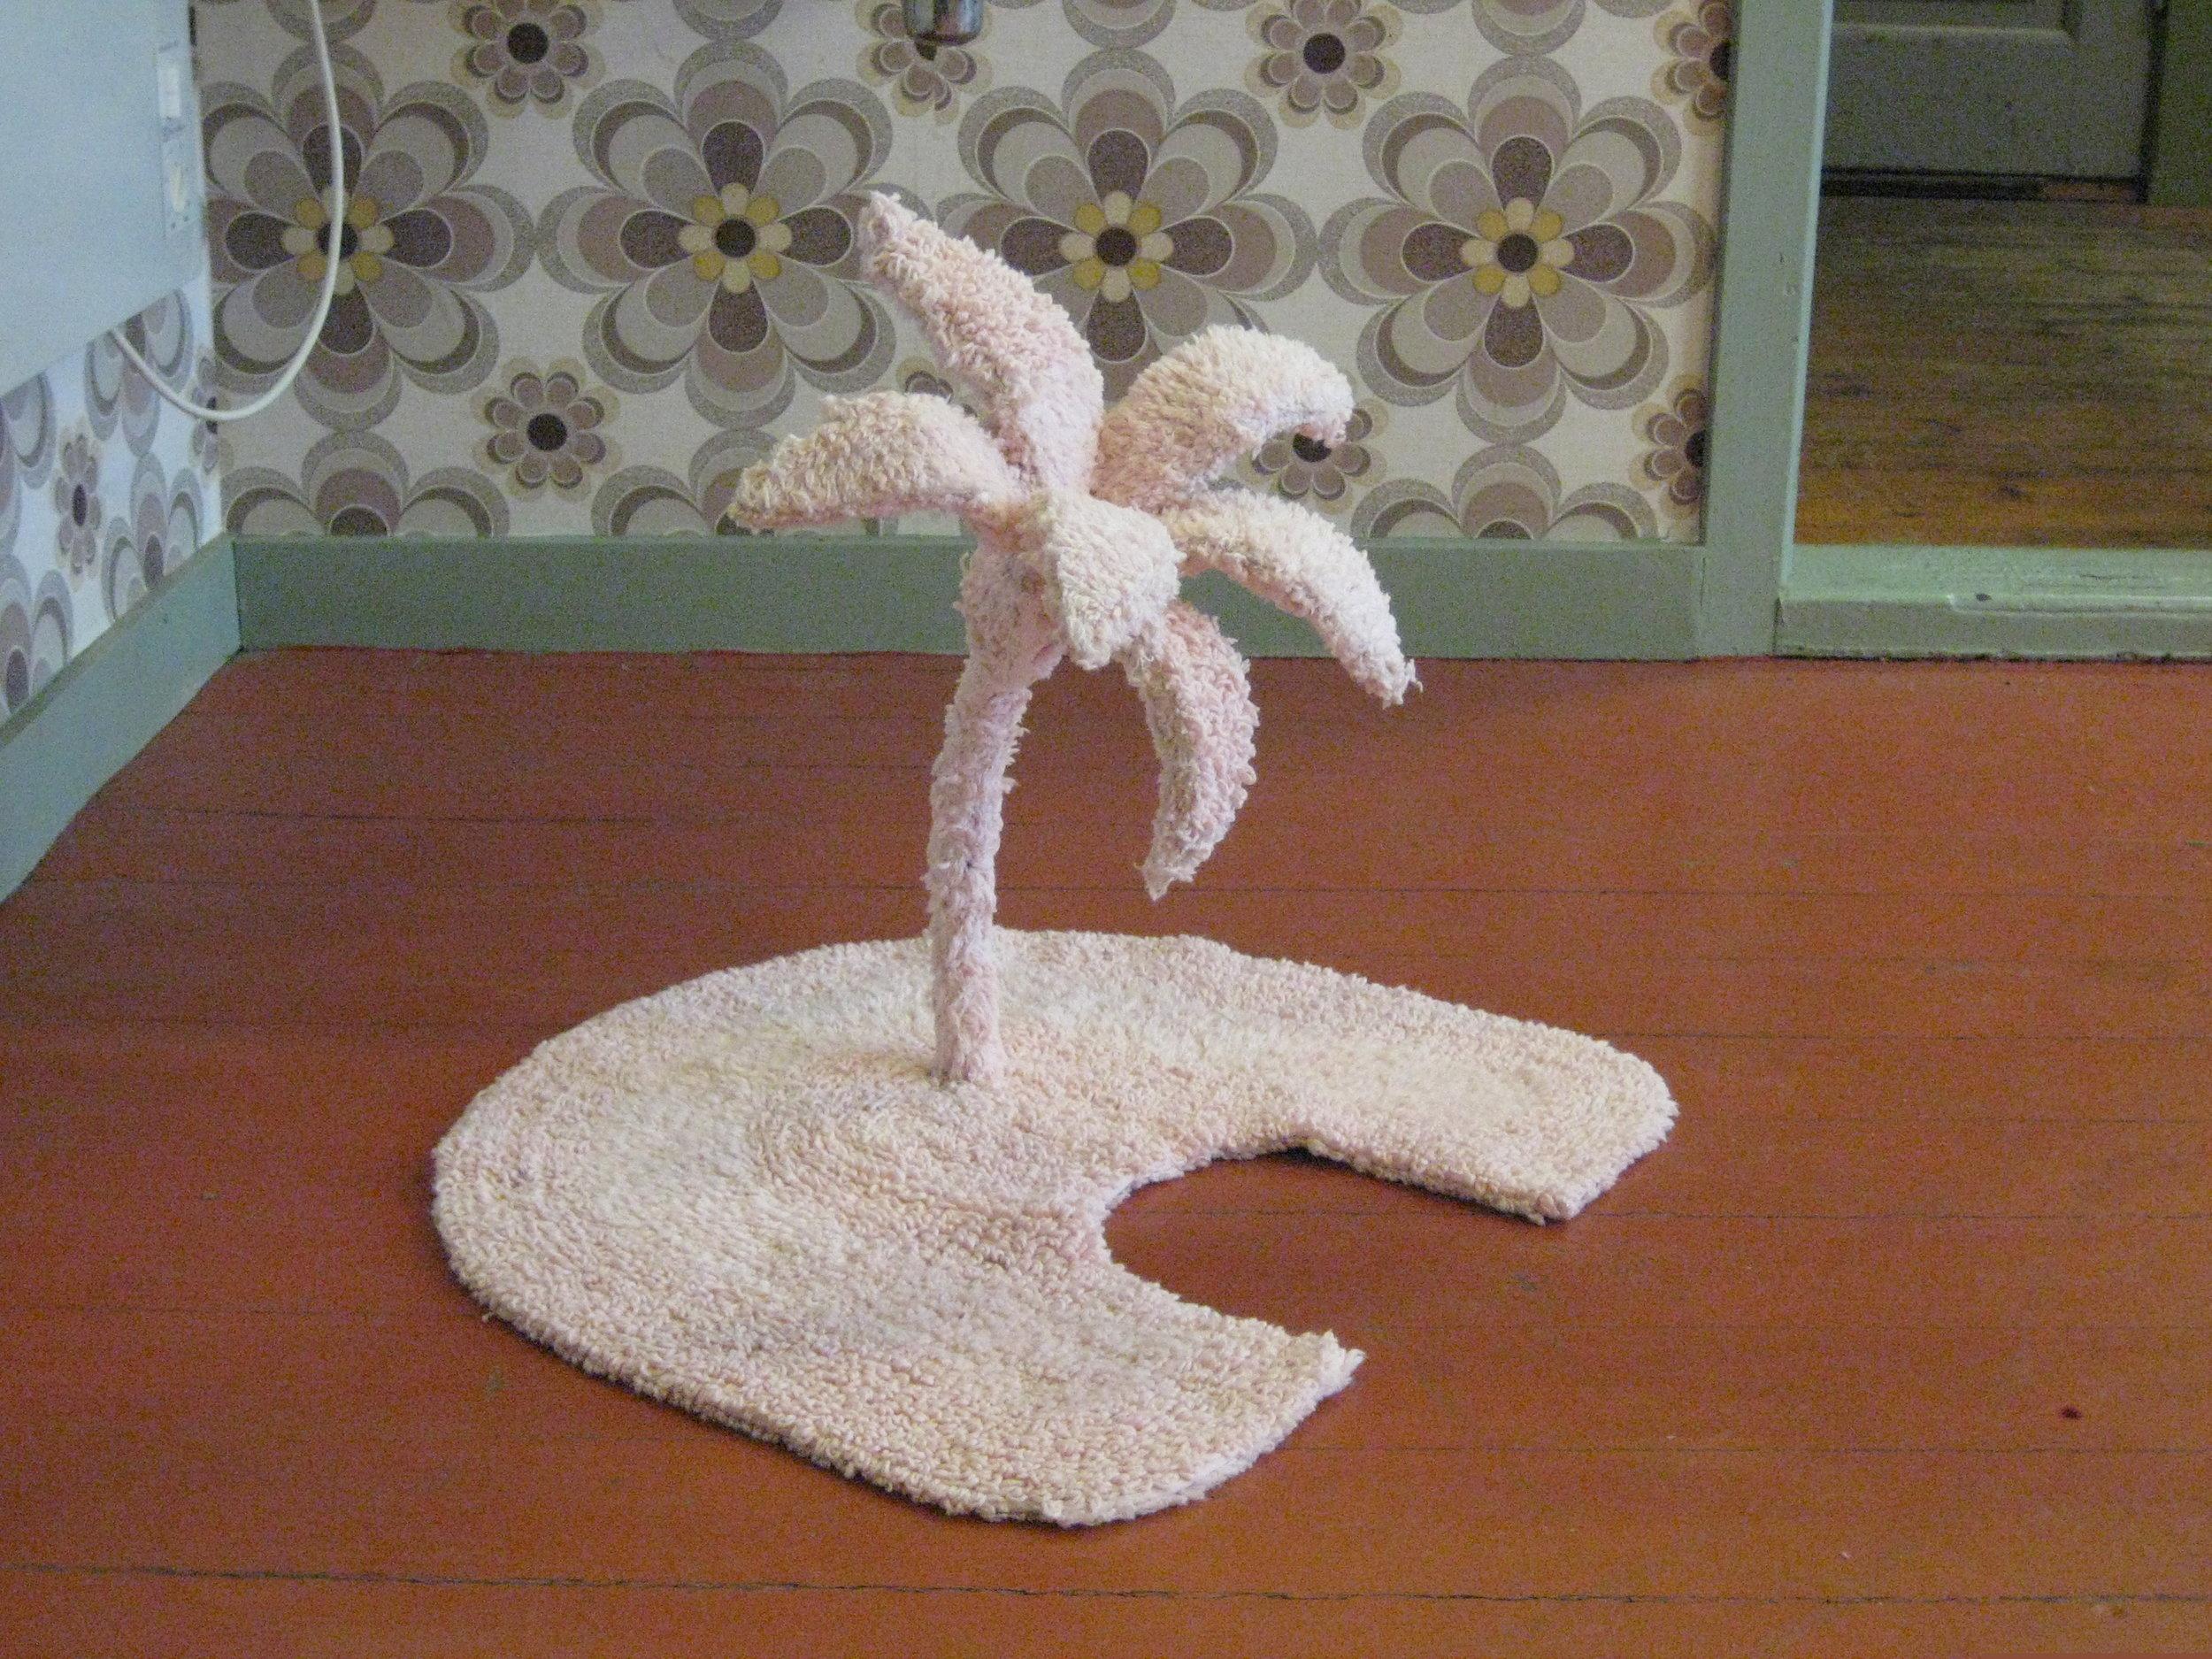 Debbie Lawson, sculpture